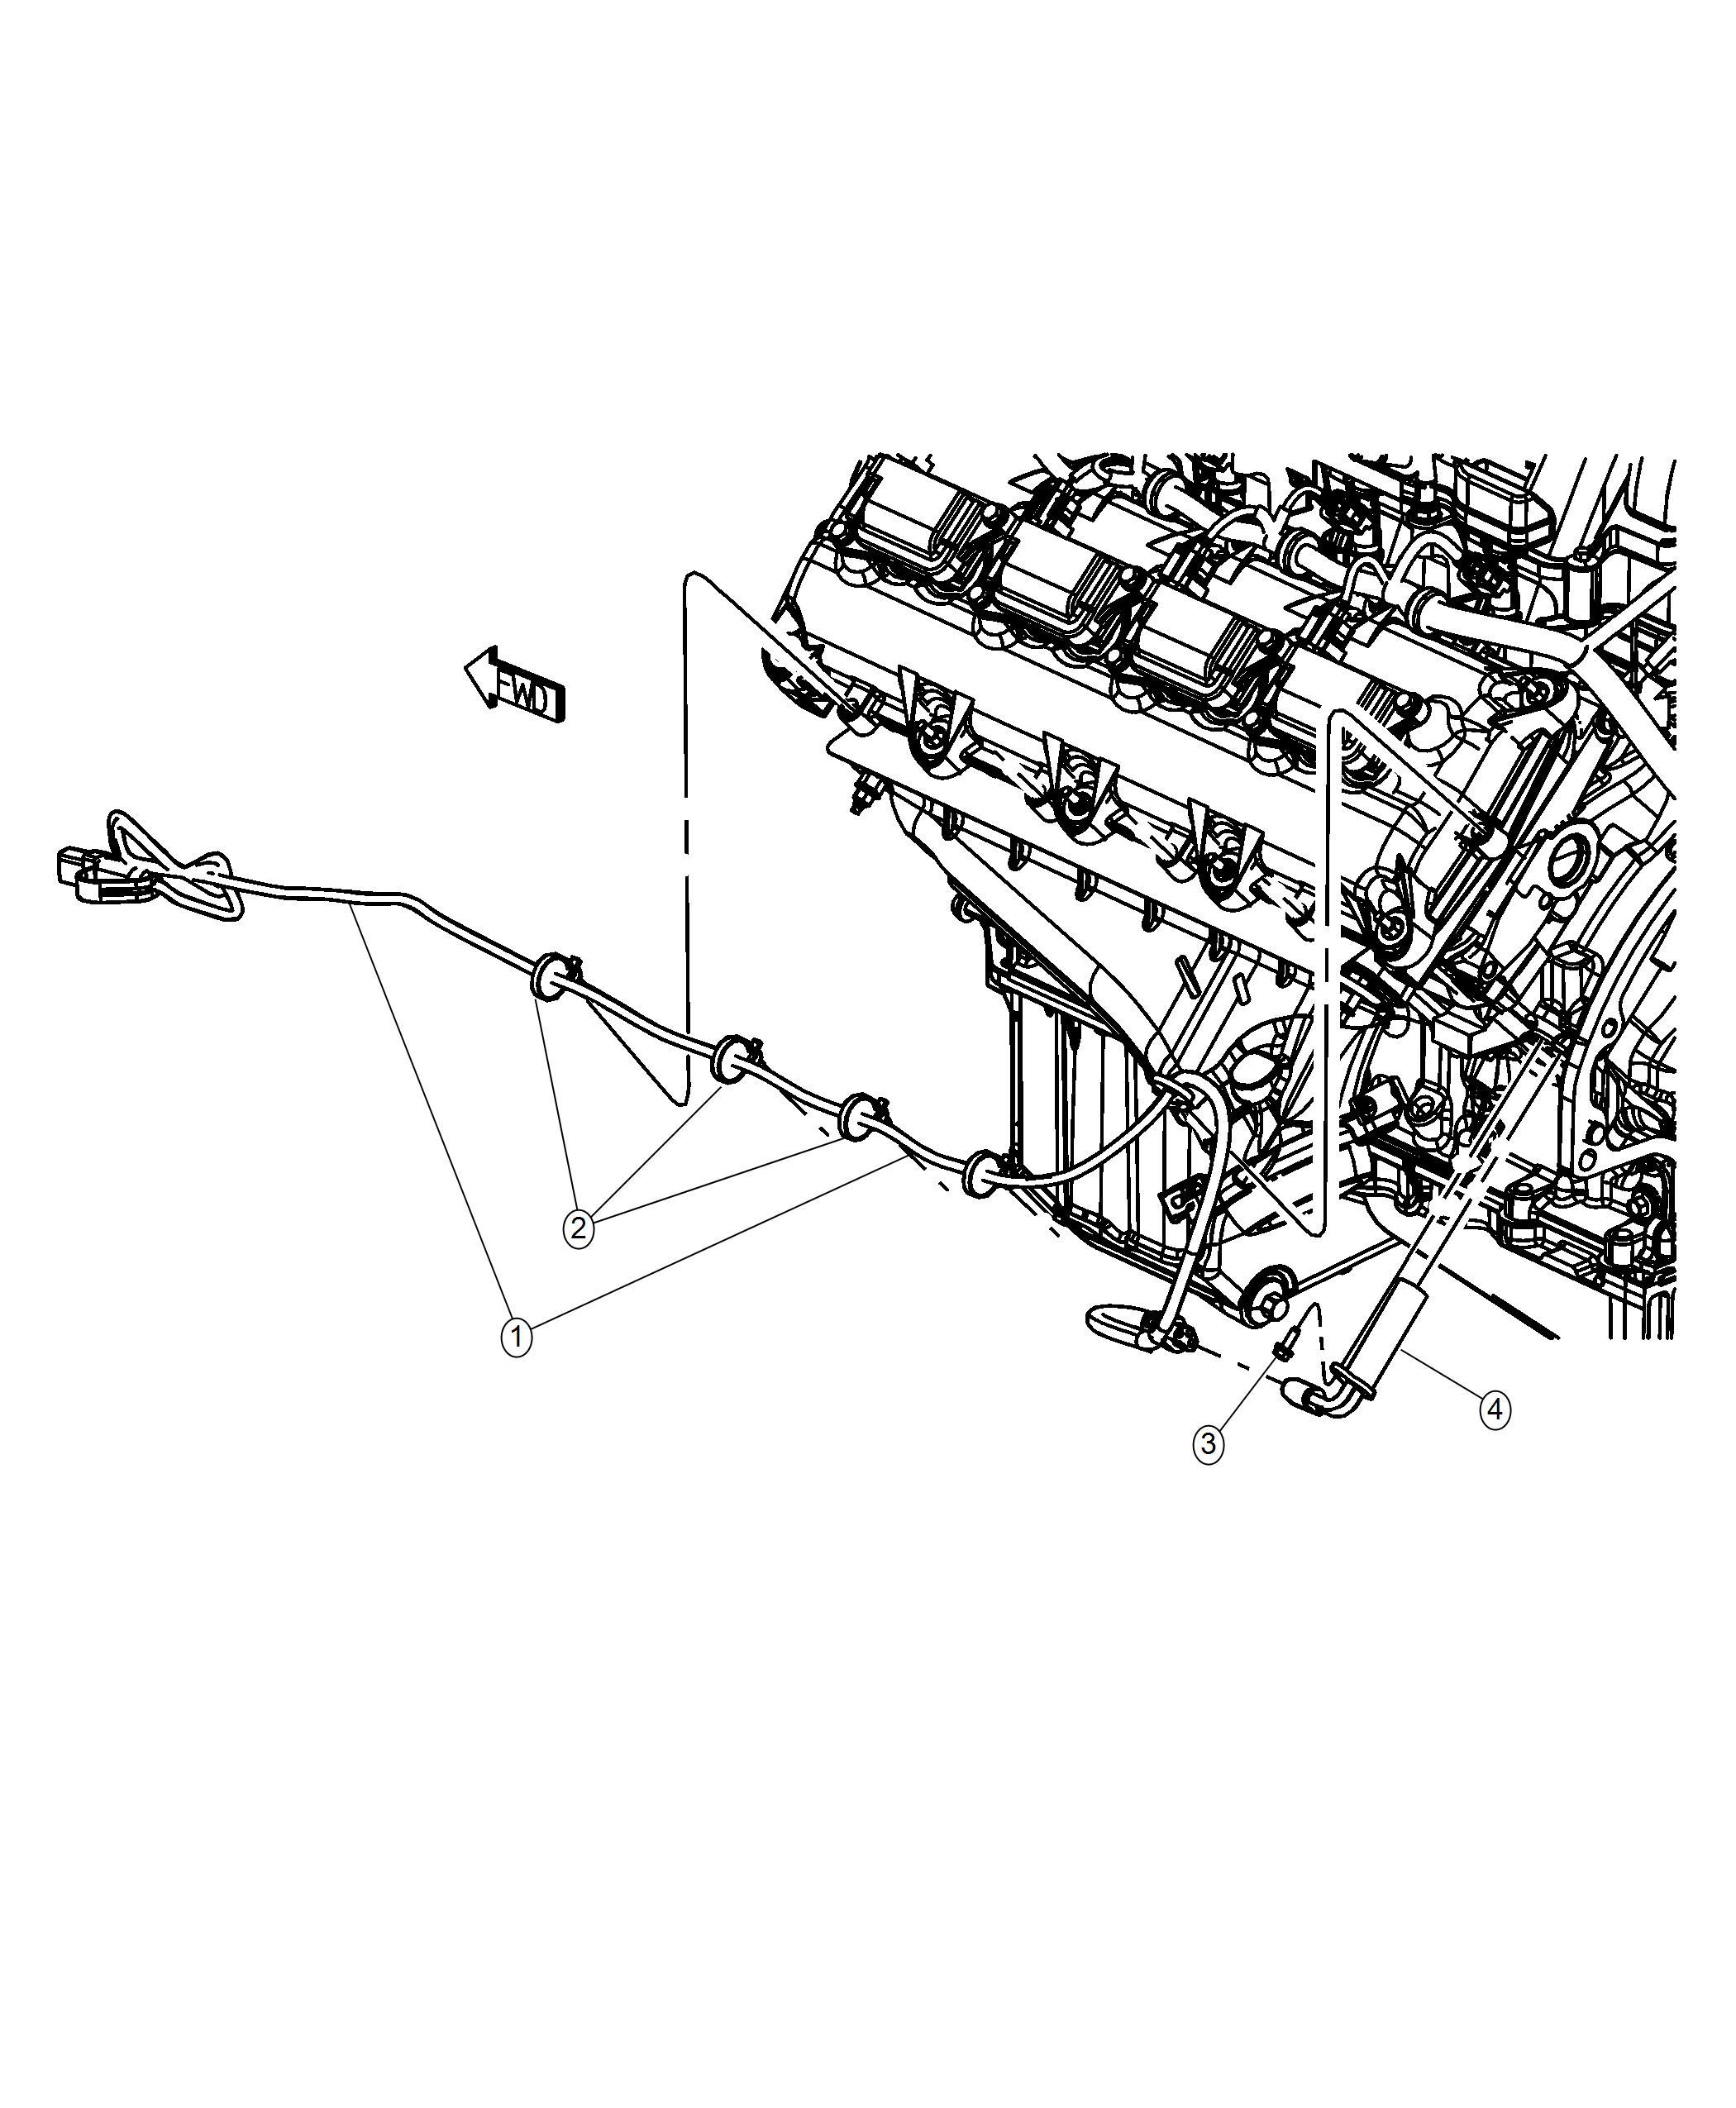 Ram 2500 Cord. Engine block heater. [engine block heater